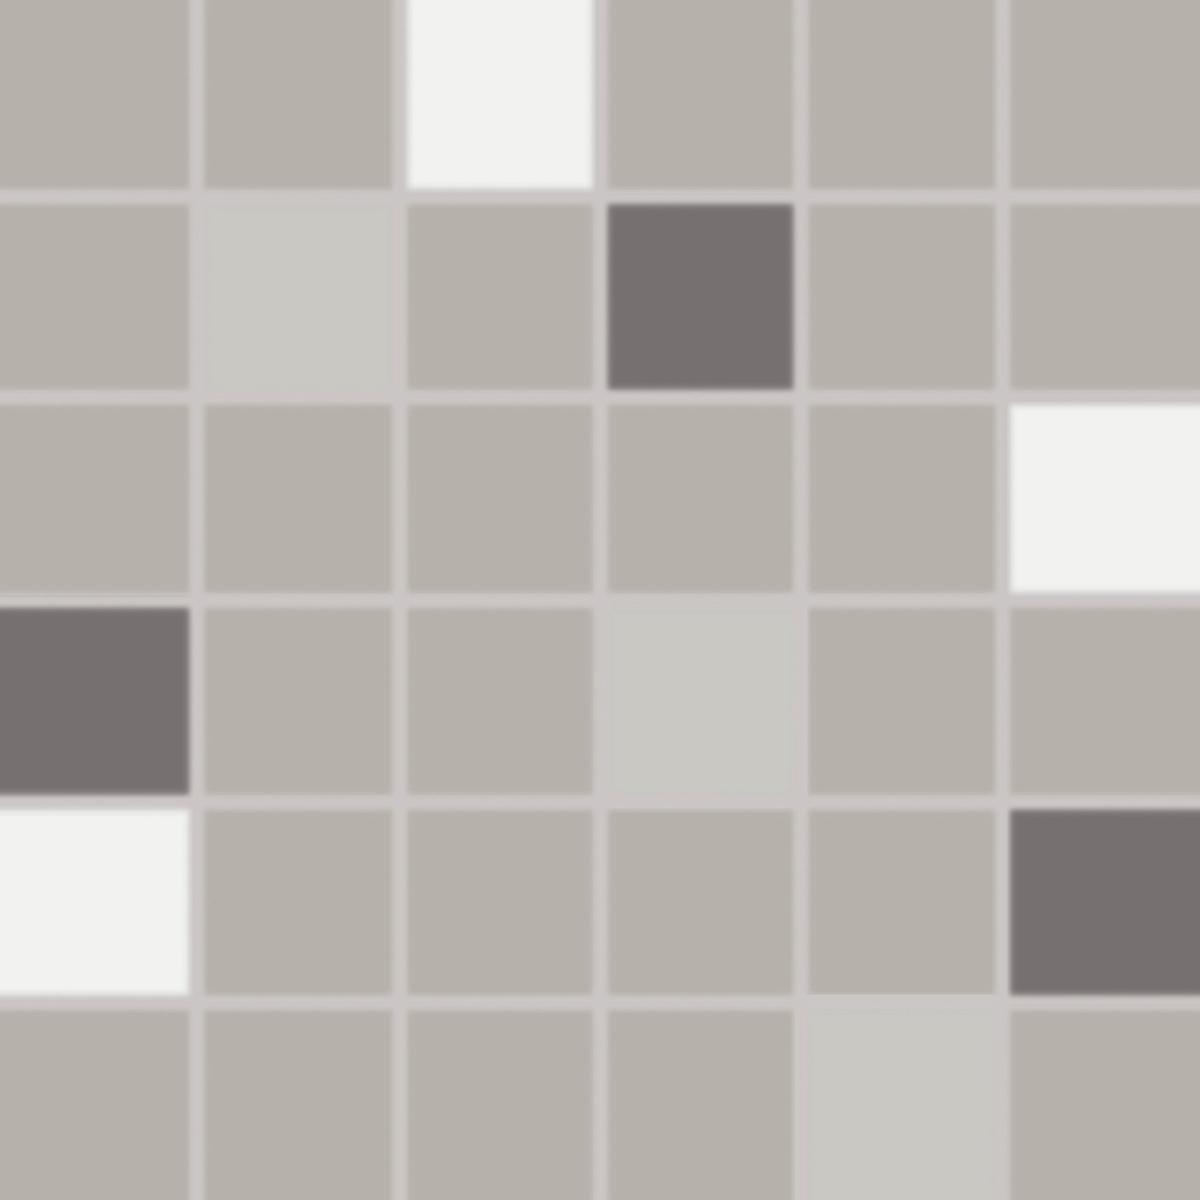 Mozaika Rako Concept Plus šedá 30x30 cm lesk WDM05010.1